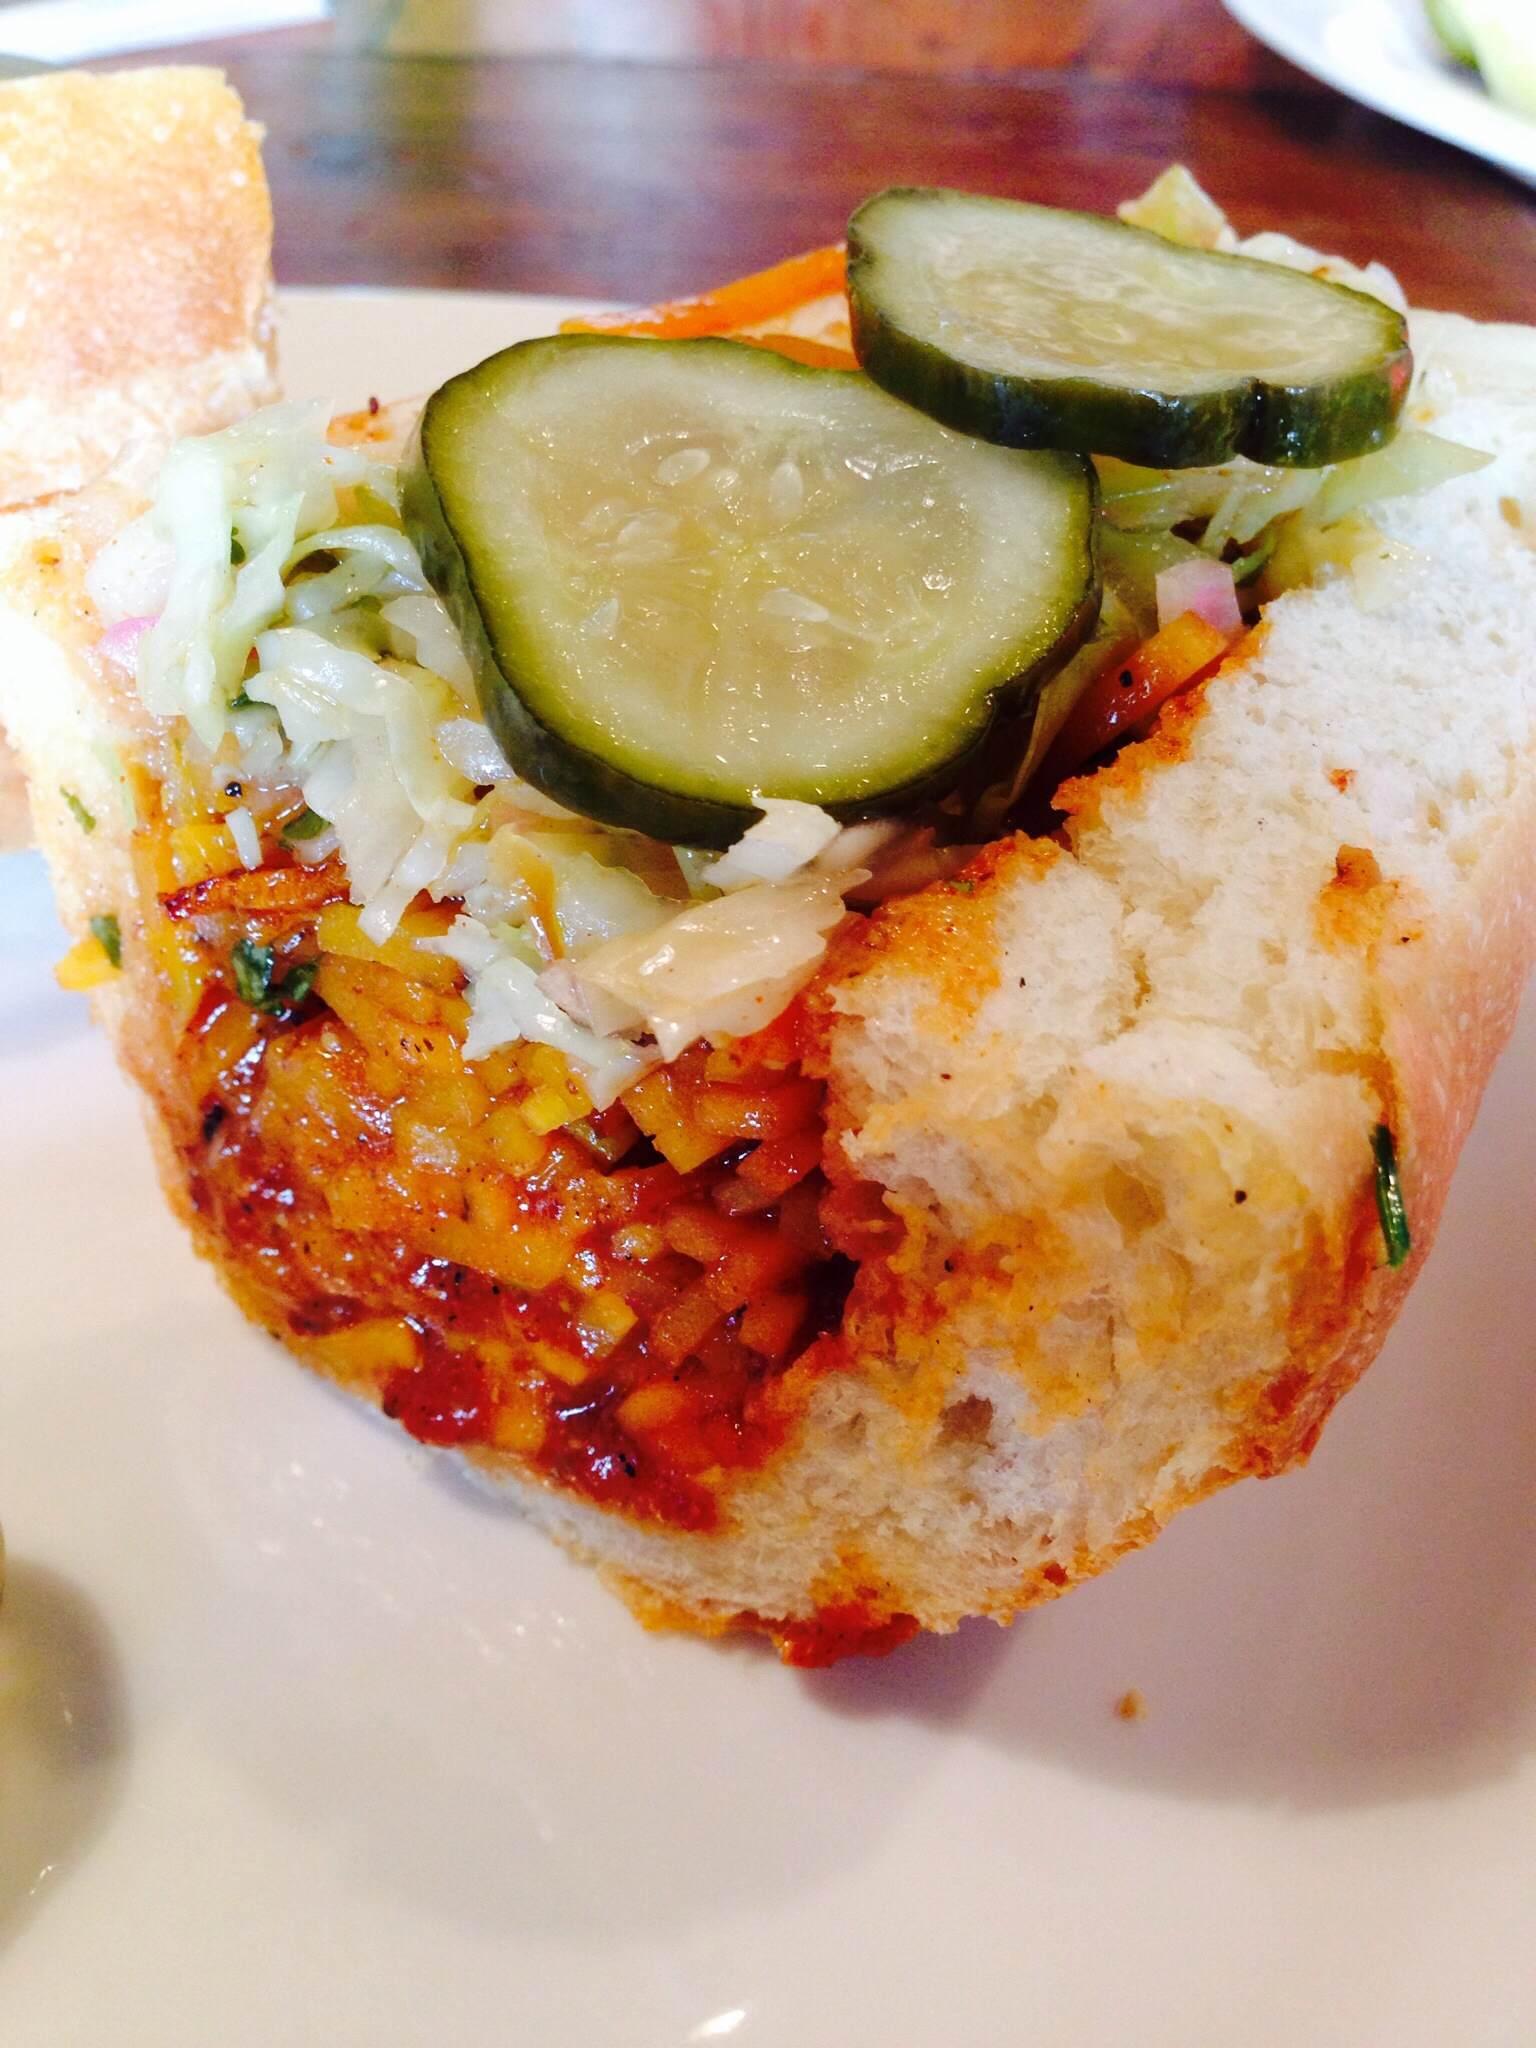 5 - Get a sandwich at Butcher & Bee